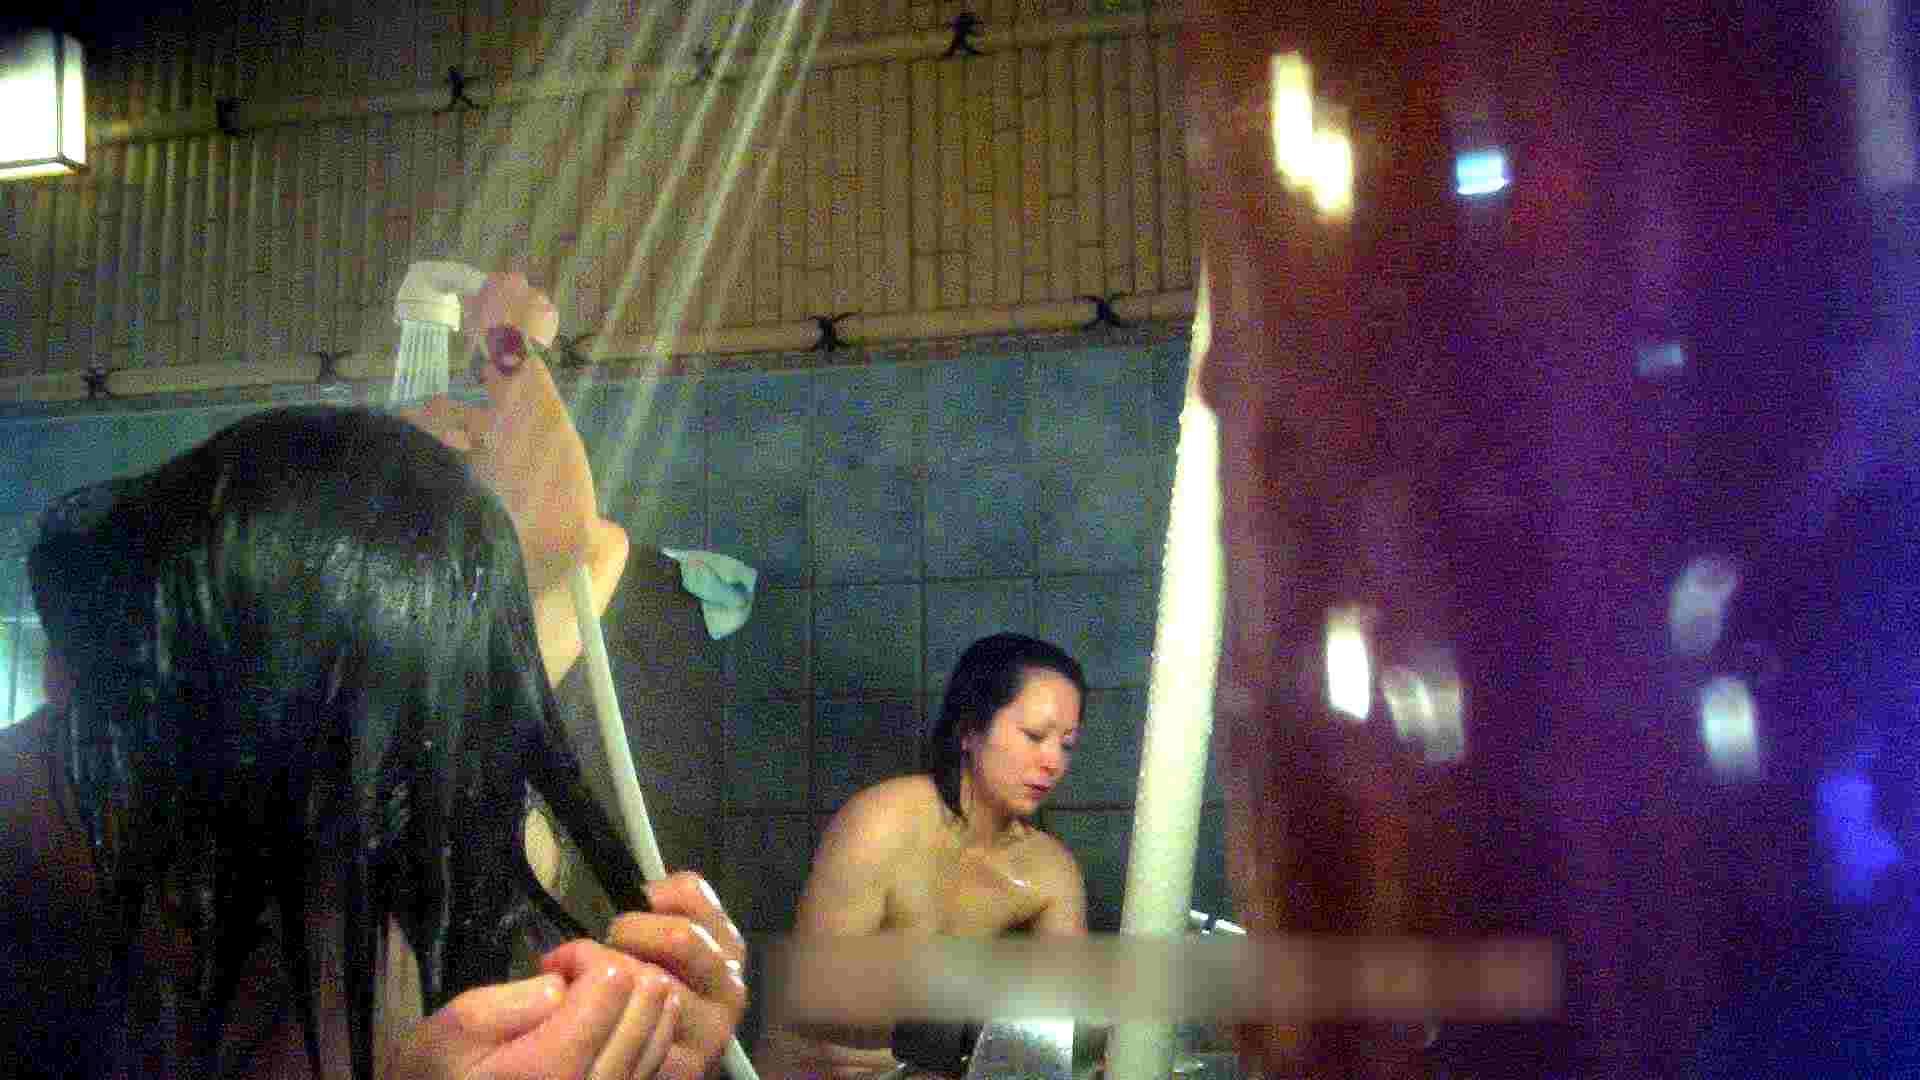 TG.12 【上等兵】いやぁ若い!ぷっちぷちギャル!でも時間短い・・・ 潜入   女風呂  67pic 46